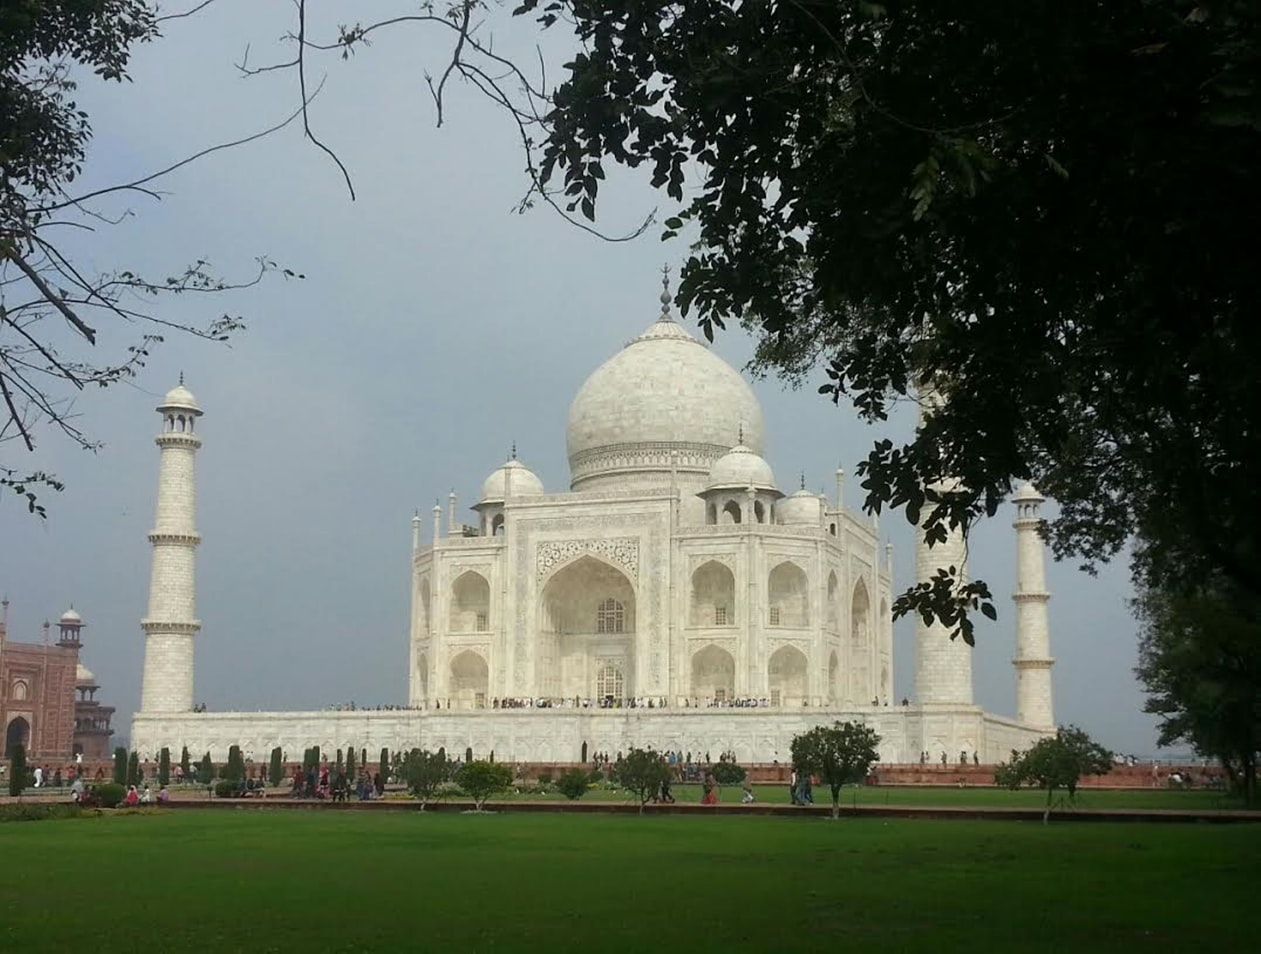 What time to visit taj mahal